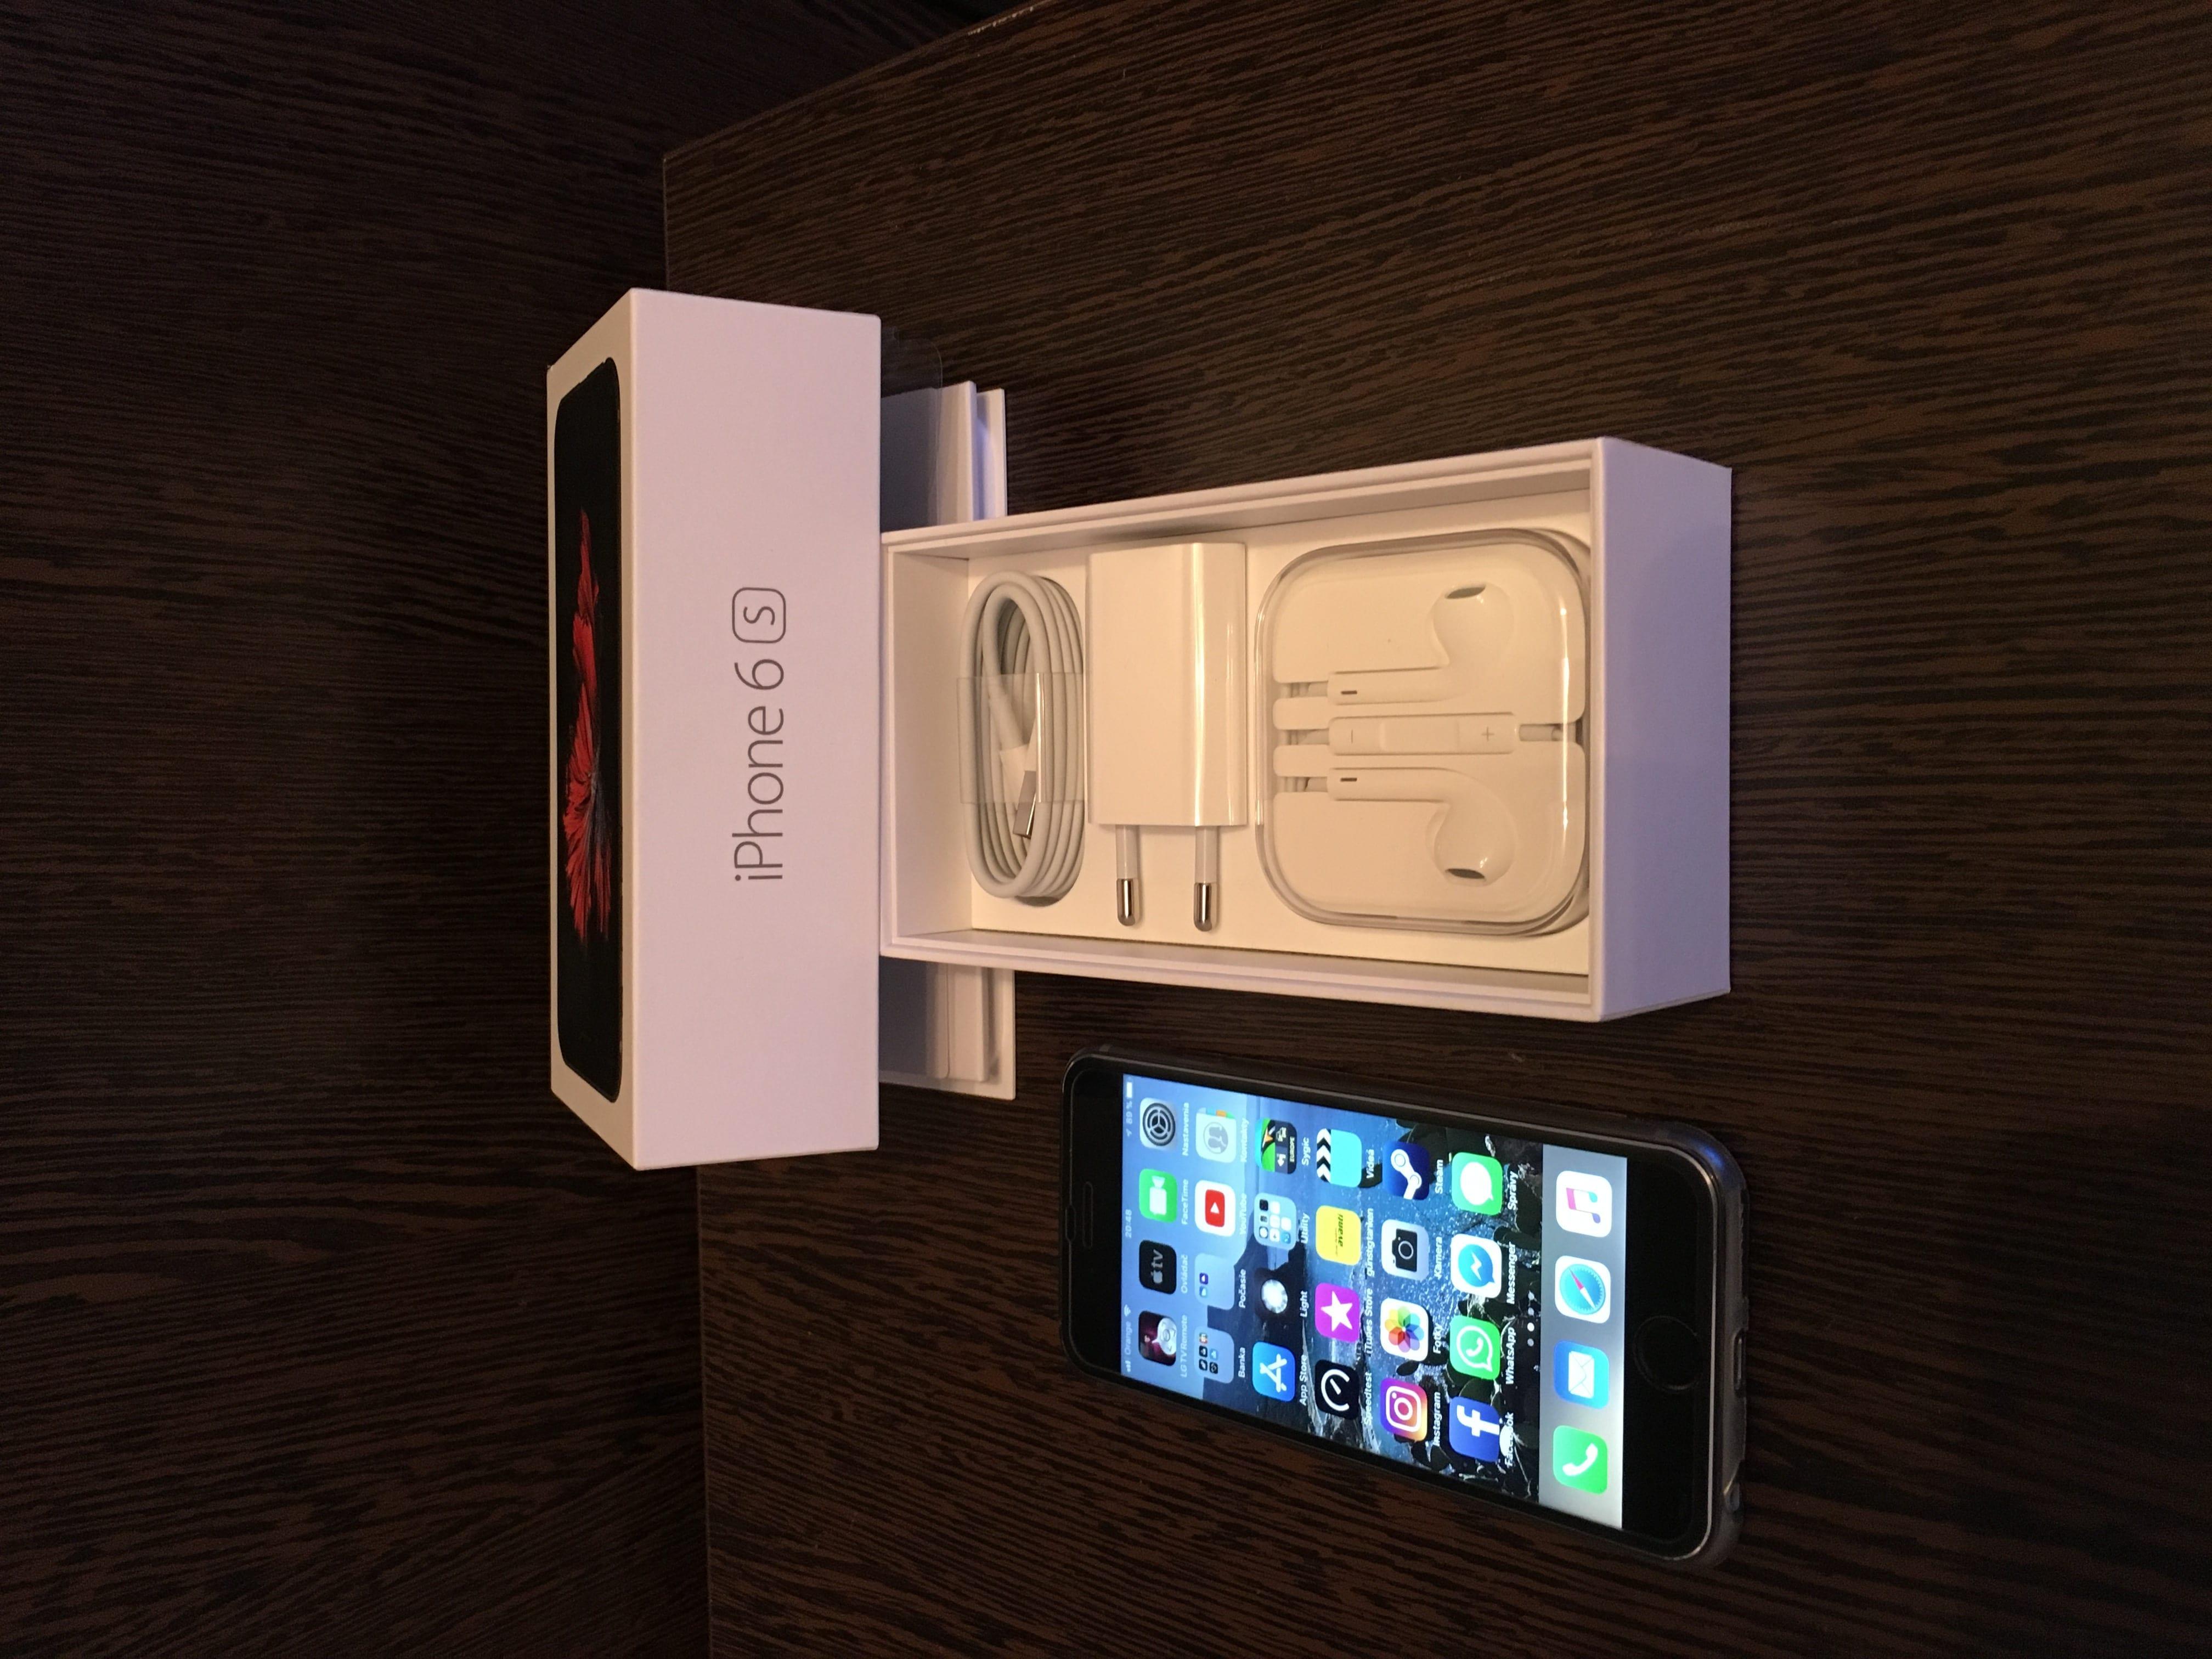 Zobraziť inzerát ~ MacBlog.sk - iPhone - Predám iPhone 6S 64gb space ... 54c679f3874